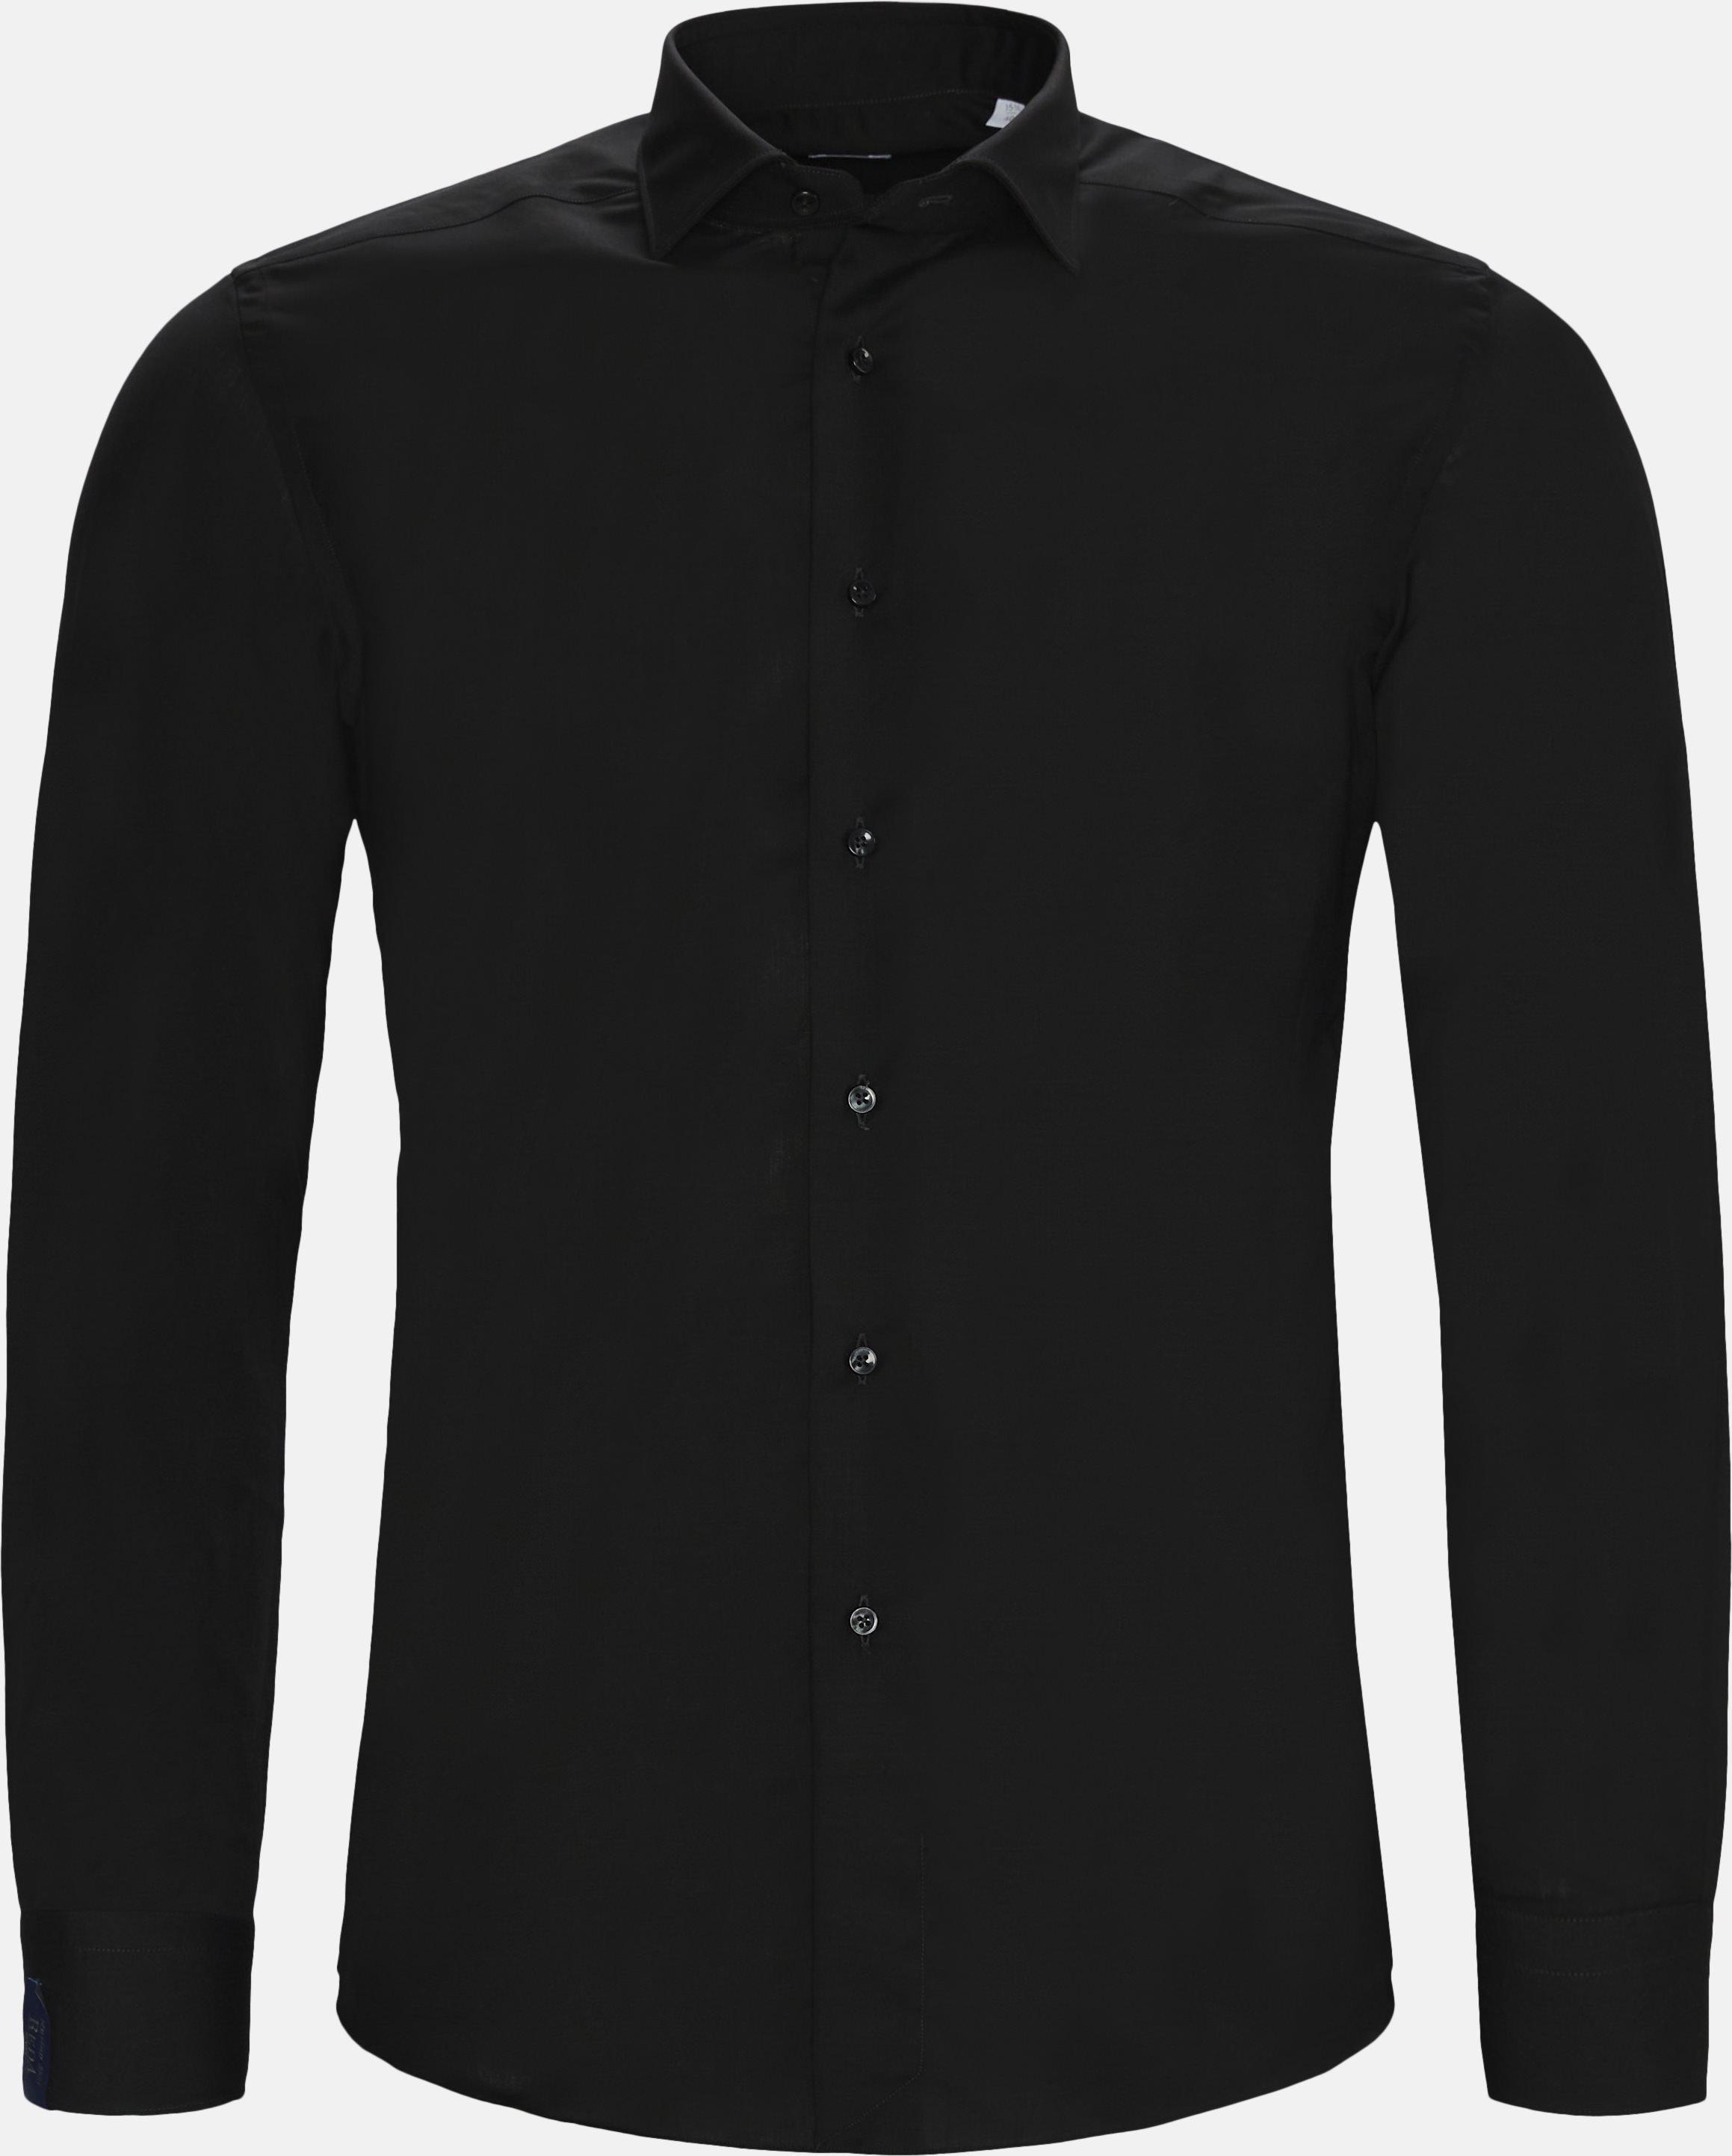 Skjorter - Tailored fit - Sort